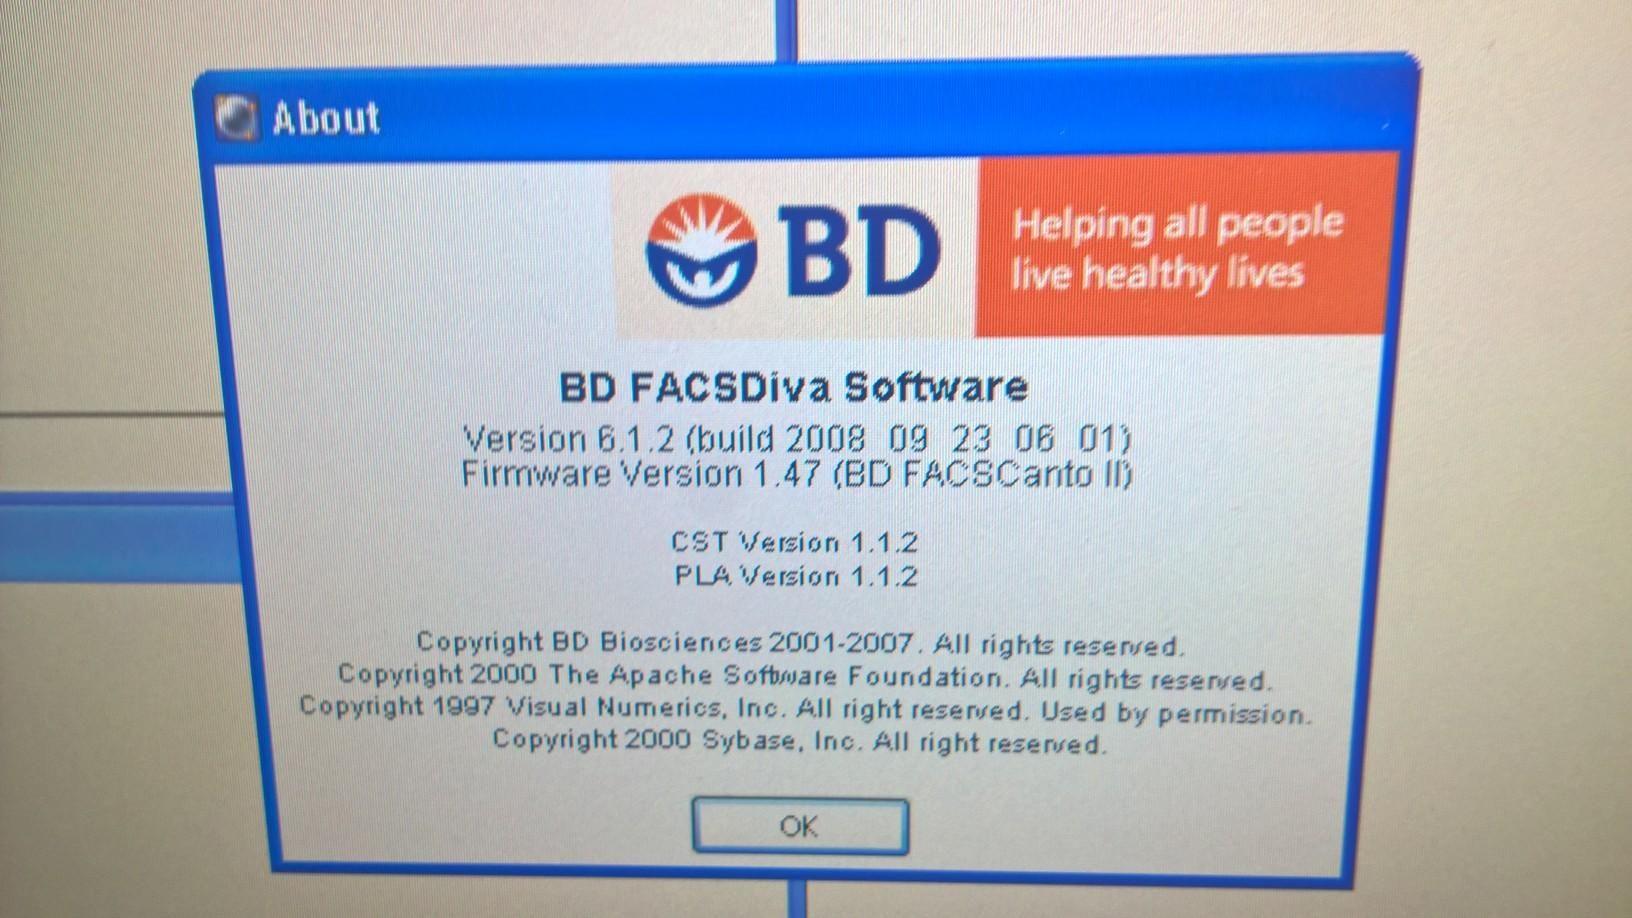 BD FACSCanto II Flow Cytometer - Certified with Warranty